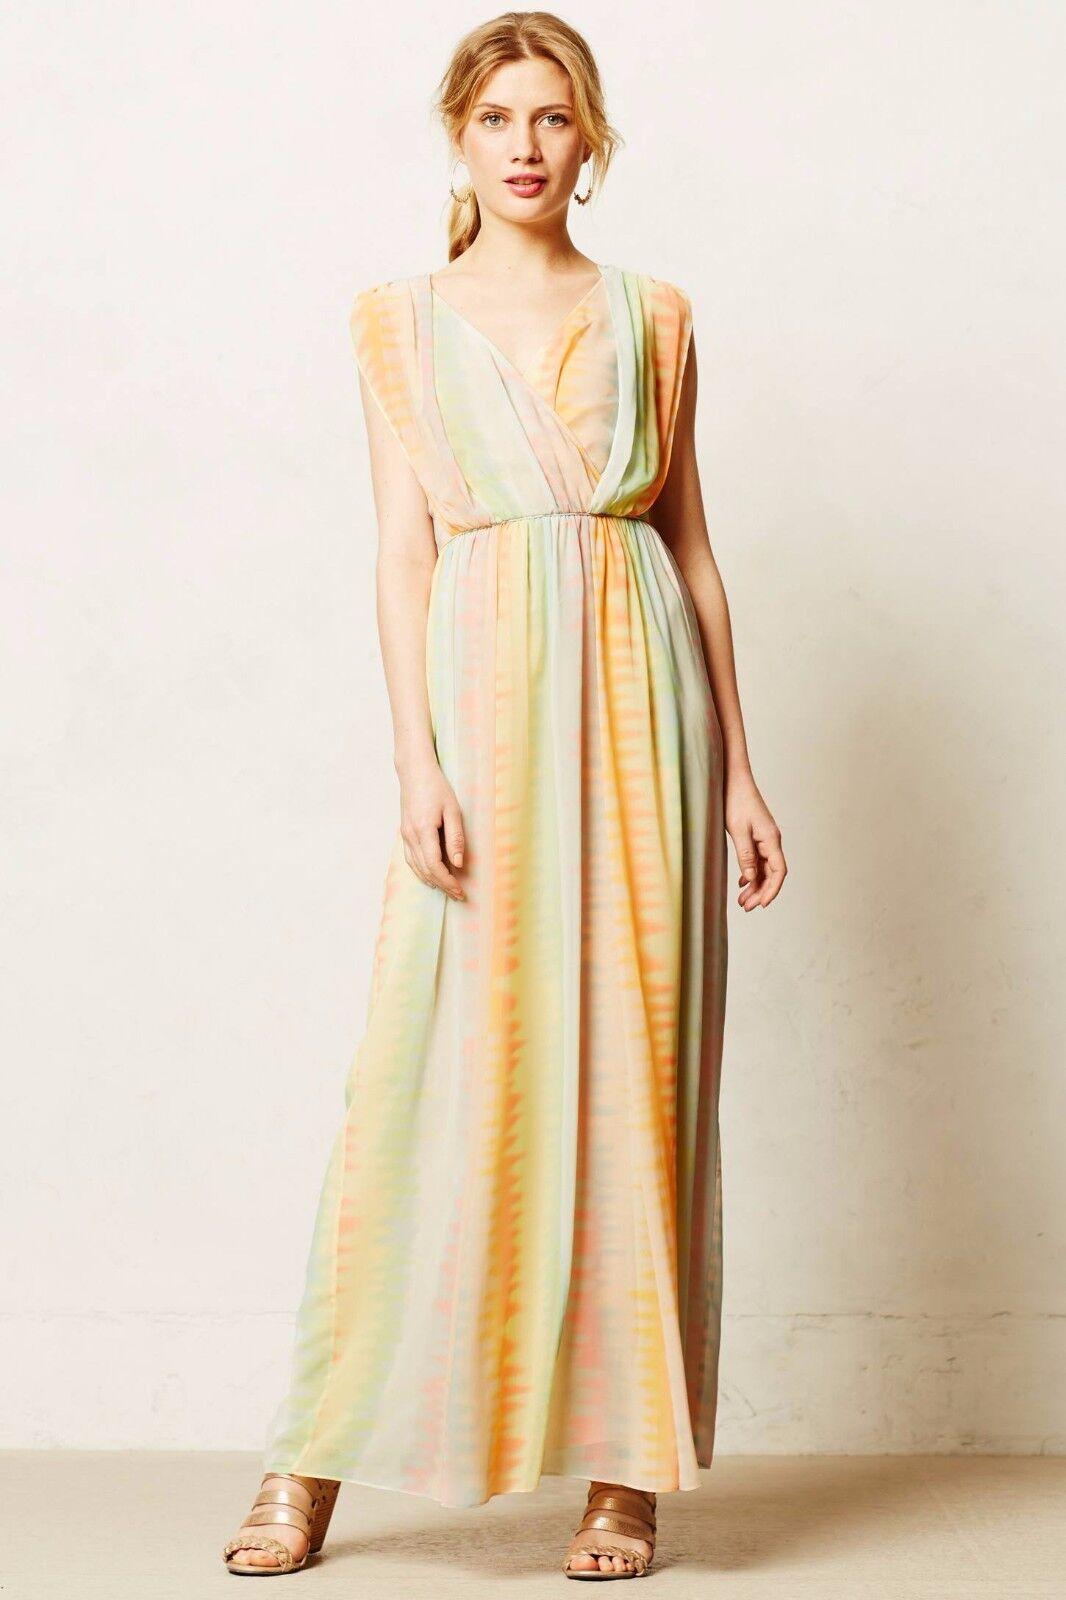 425b312b45 NEW Anthropologie Solen Dress by Lil, 2P, Tie Dye Surplice Maxi Petite Maxi  nttolc260-Dresses